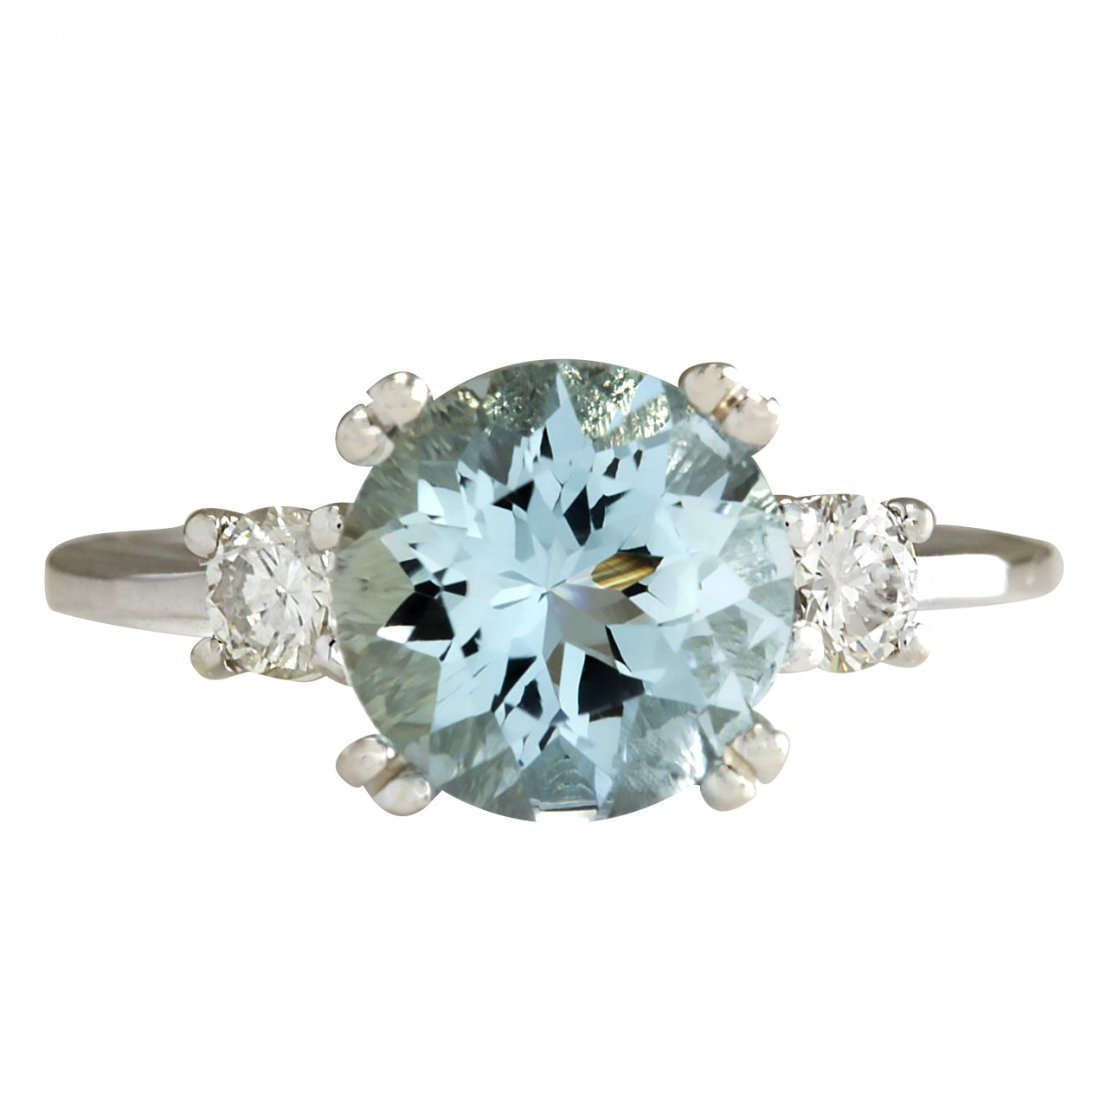 2.33CTW Natural Aquamarine And Diamond Ring In 14K